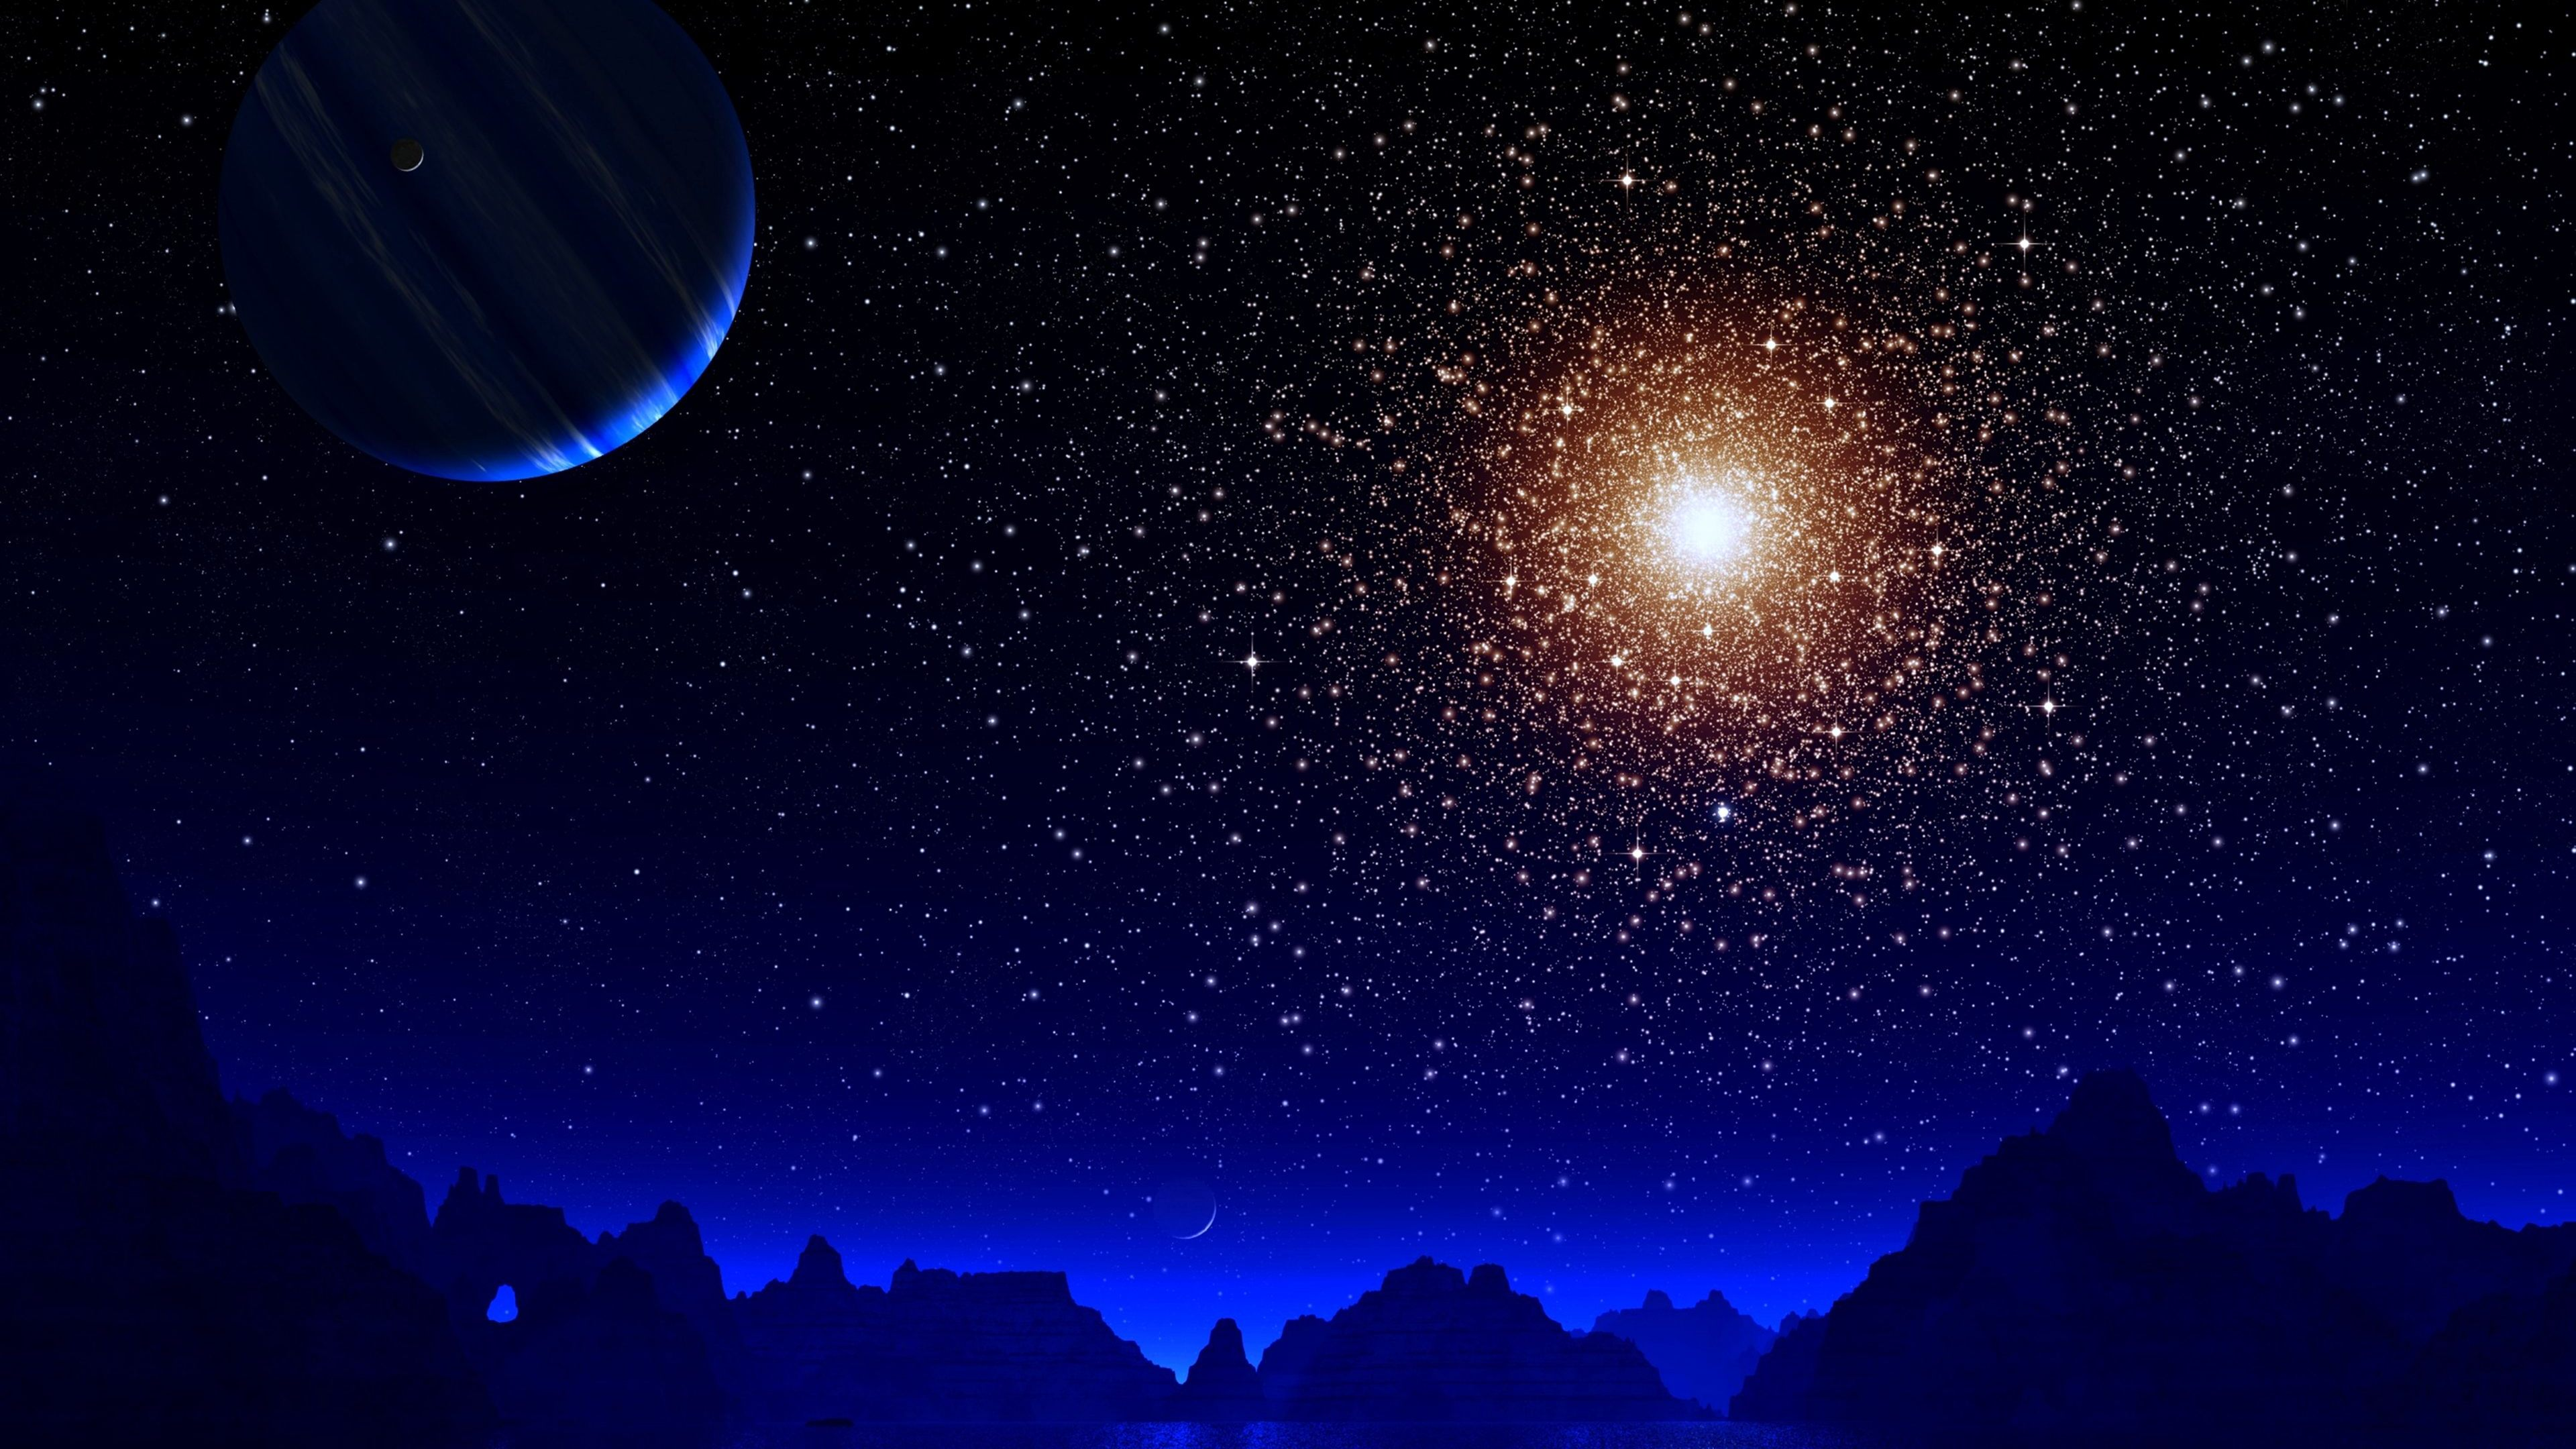 blue night moon stars earth 4k 1546278795 - Blue Night Moon Stars Earth 4k - stars wallpapers, night wallpapers, moon wallpapers, hd-wallpapers, earth wallpapers, digital universe wallpapers, digital art wallpapers, artwork wallpapers, artist wallpapers, 4k-wallpapers